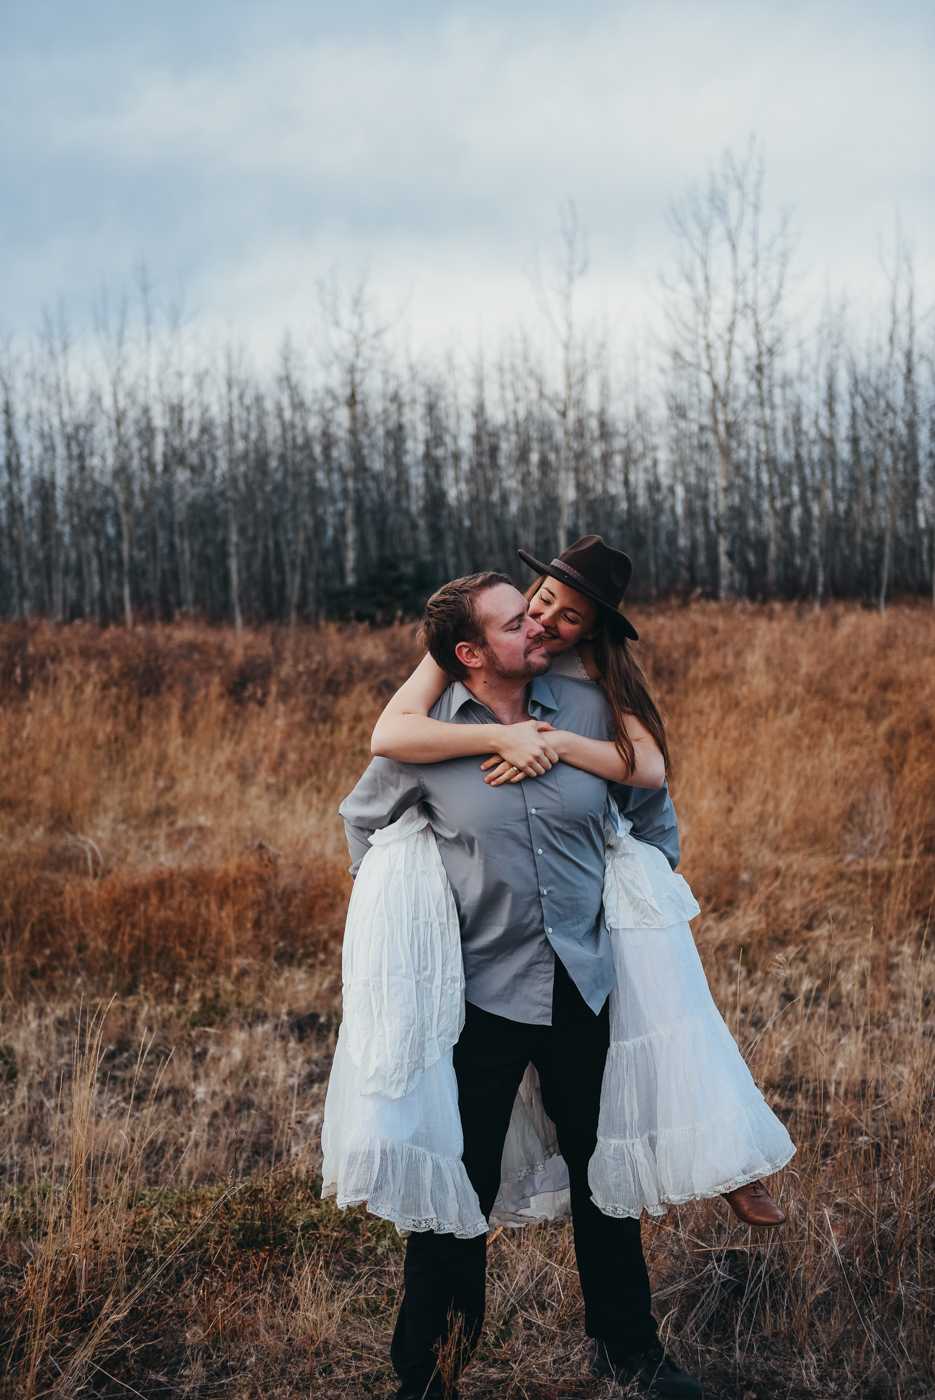 FortSt.John_photographer_TyraEPhotography_Wedding_Couple_Family_Photograhy_DawsonCreek_Elopement_Bride_Boduoir_Portraits-45.jpg